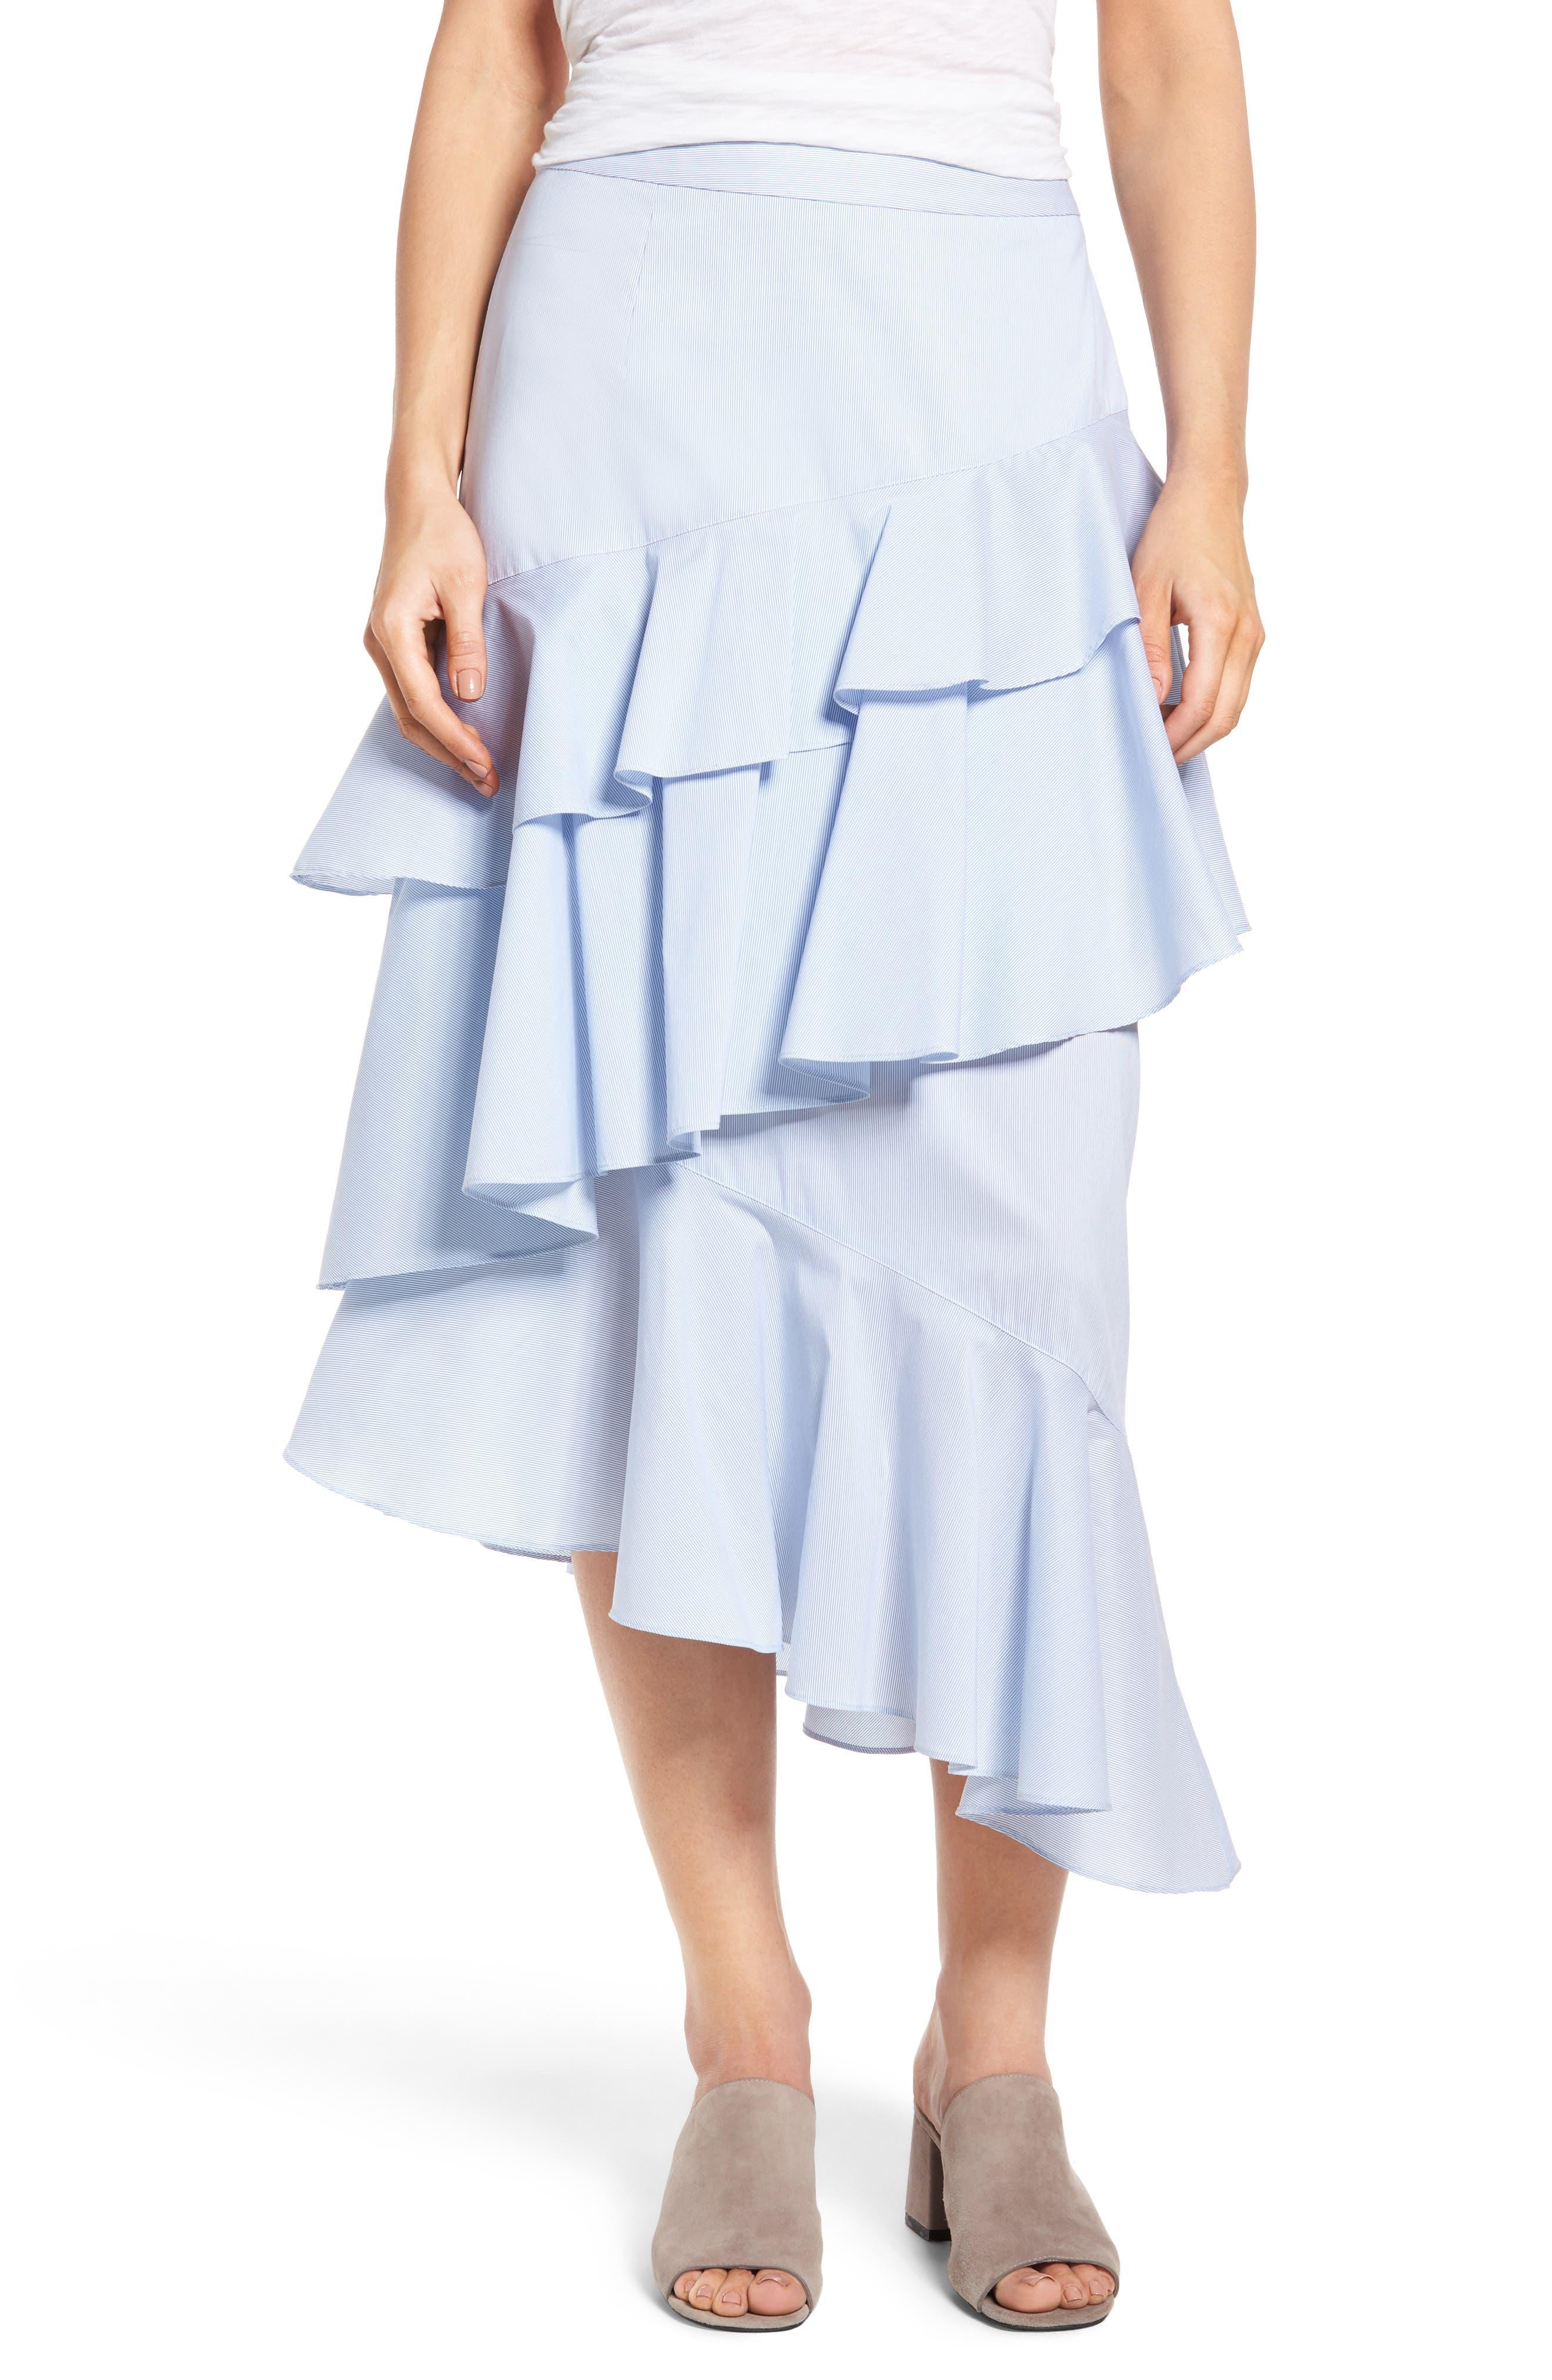 Alternate Image 1 Selected - Chelsea28 Ruffle Midi Skirt